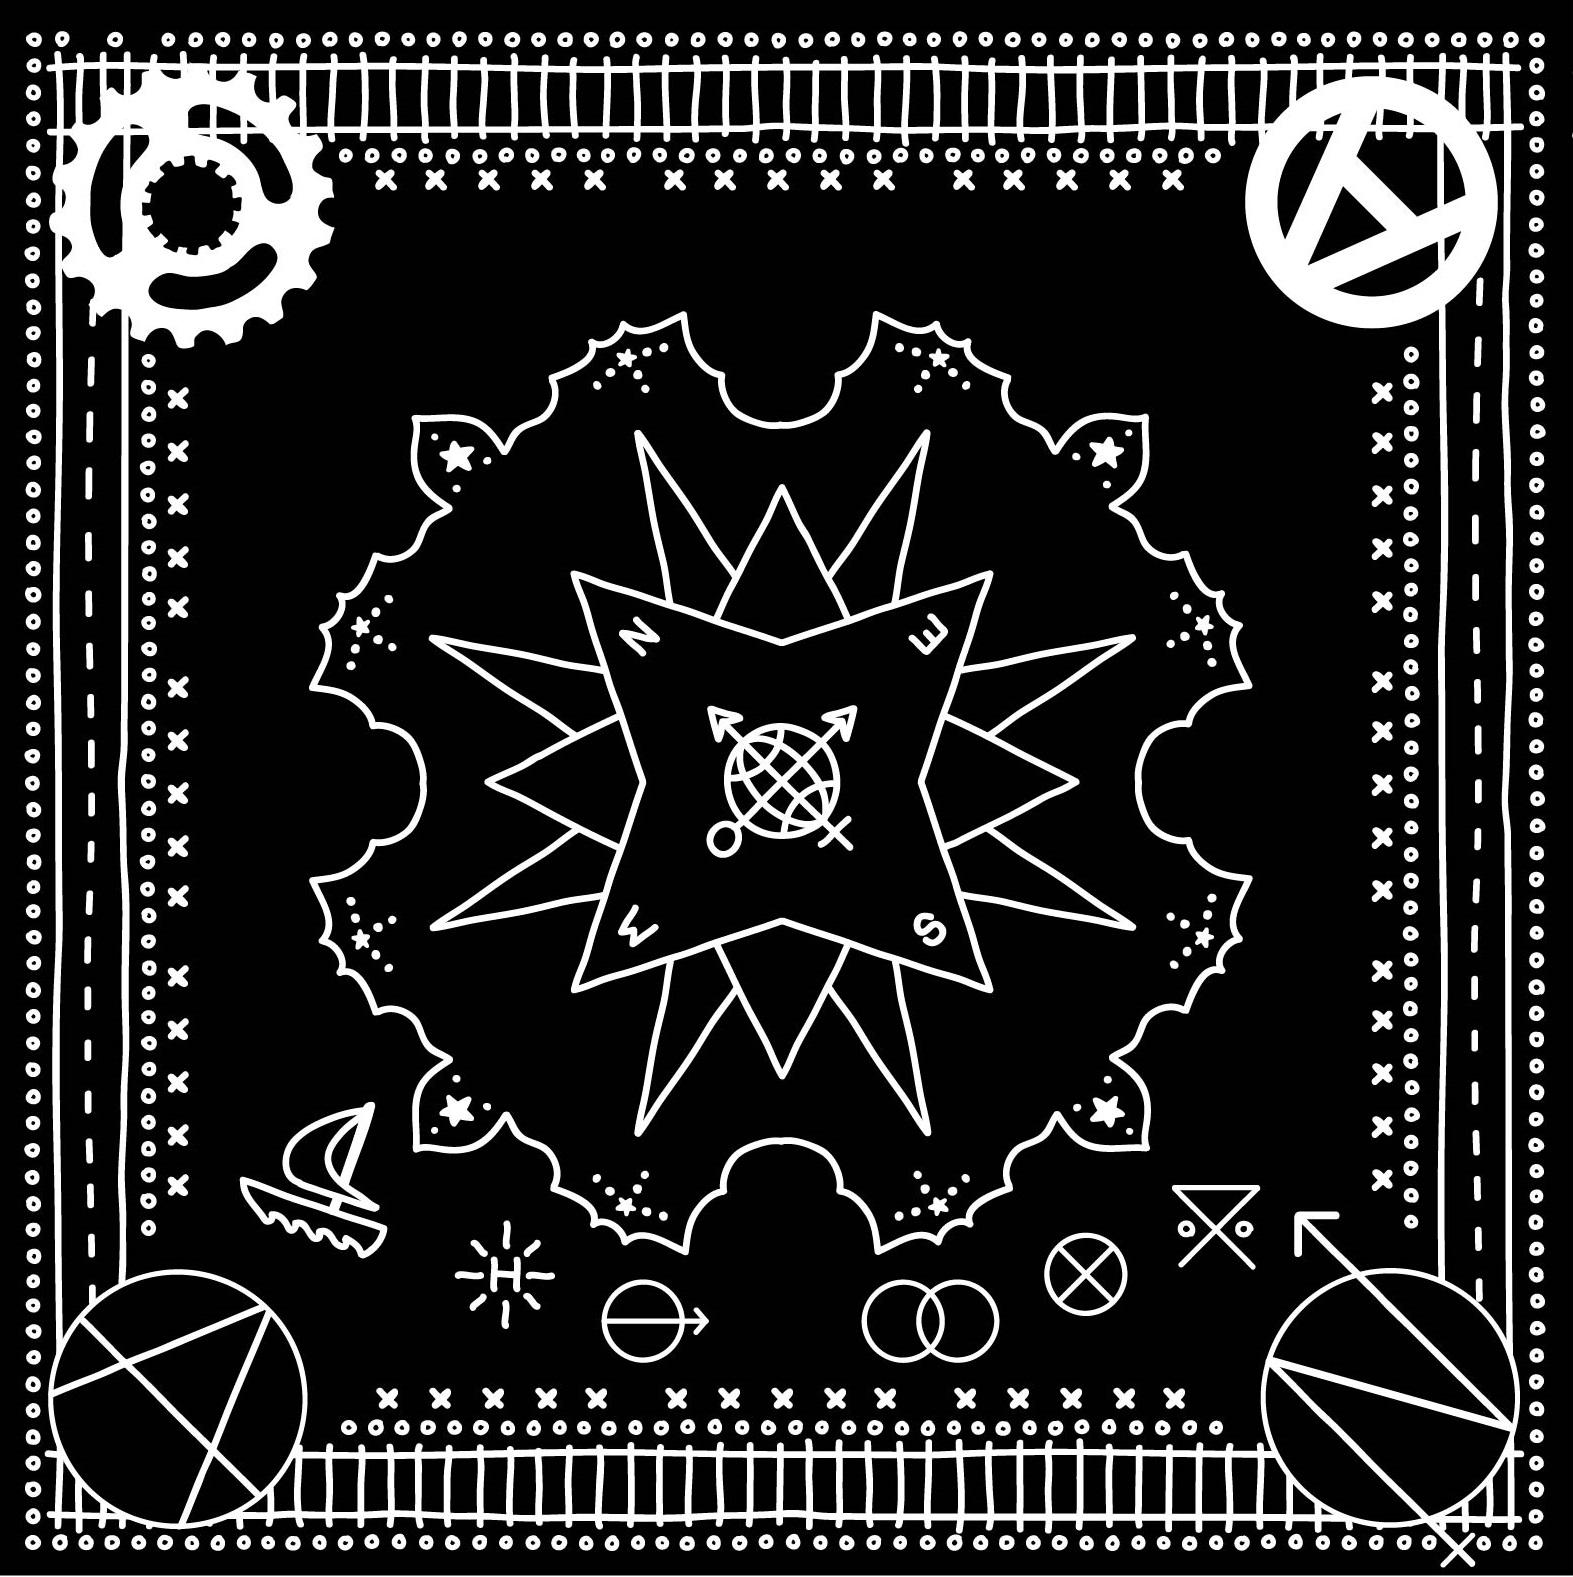 bandkerchief_stpversion-jpg.17186